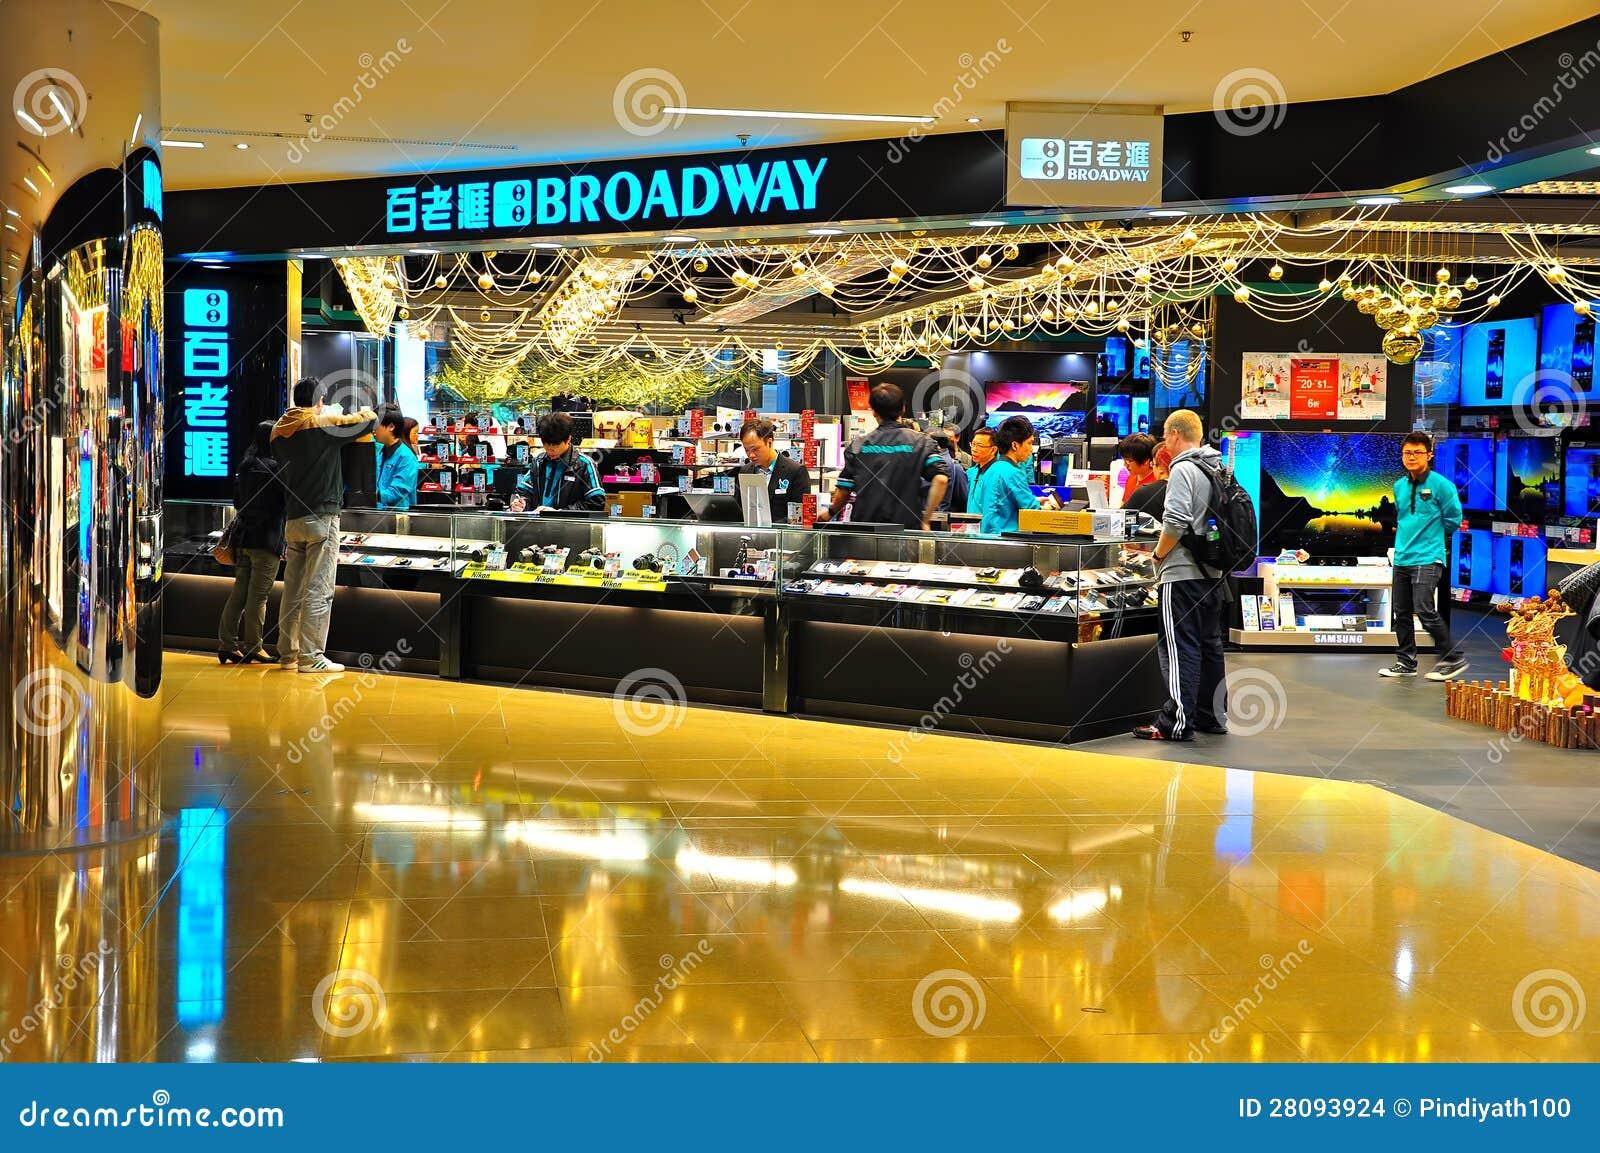 Broadway Electronics Store In Hong Kong Editorial Stock Image - Image: 28093924